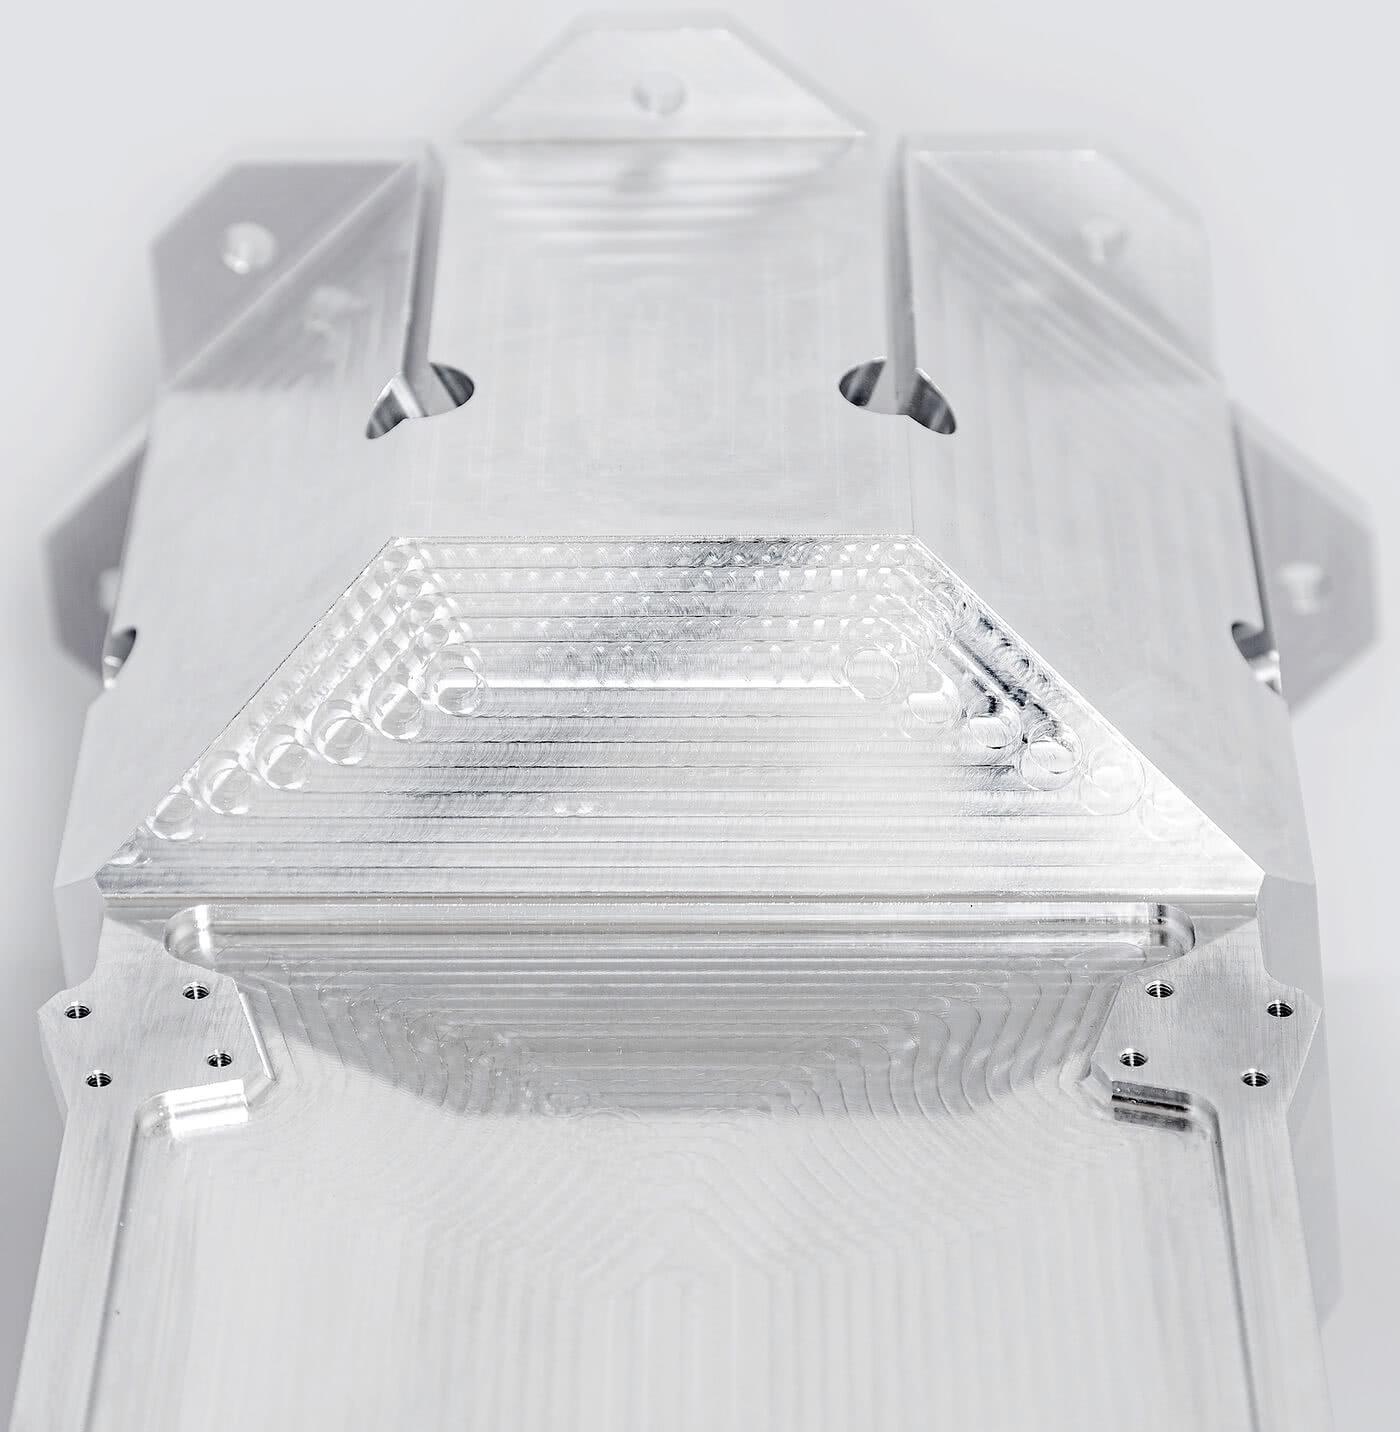 Laro NC Aluminium Raumfahrt Teil.jpg